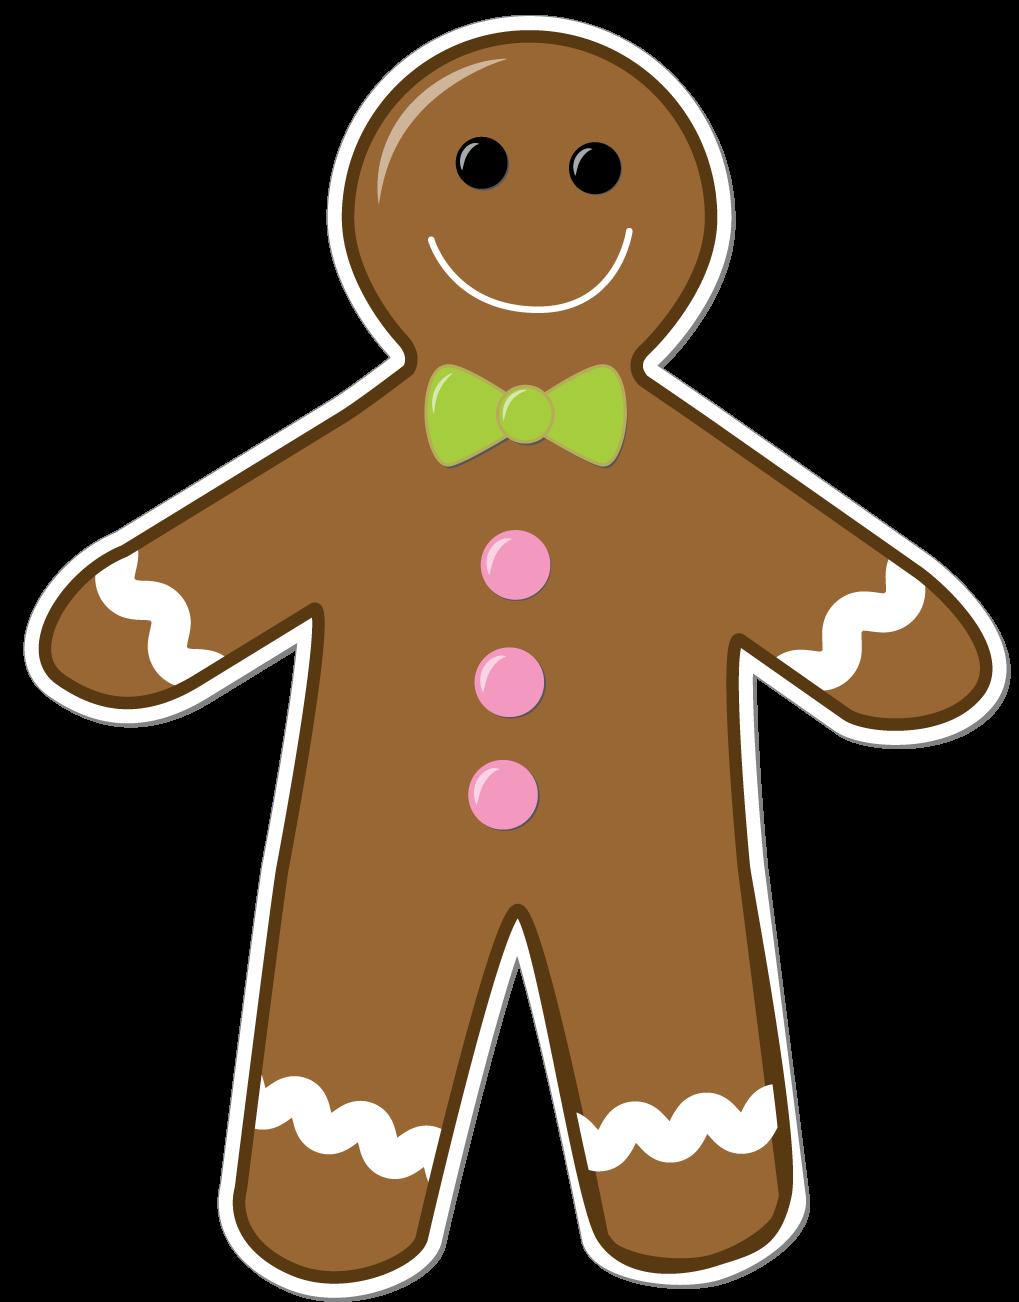 Gingerbread man border clipart